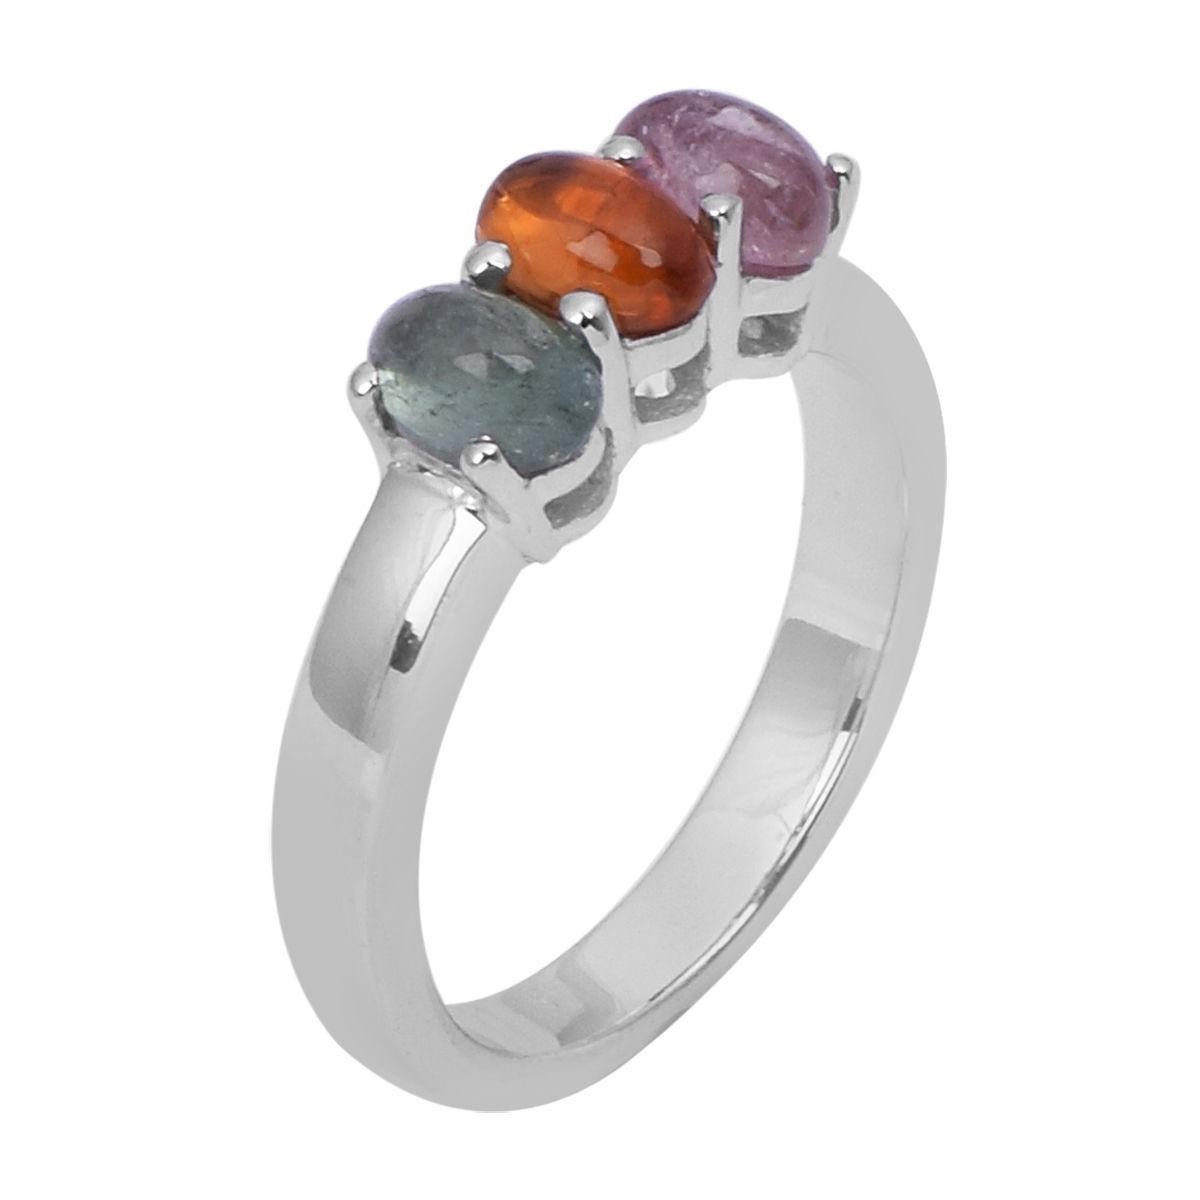 Multi Color Three Tourmaline Jewelry Ring 925 Sterling Silver Ring Sz 7 SHRI0768